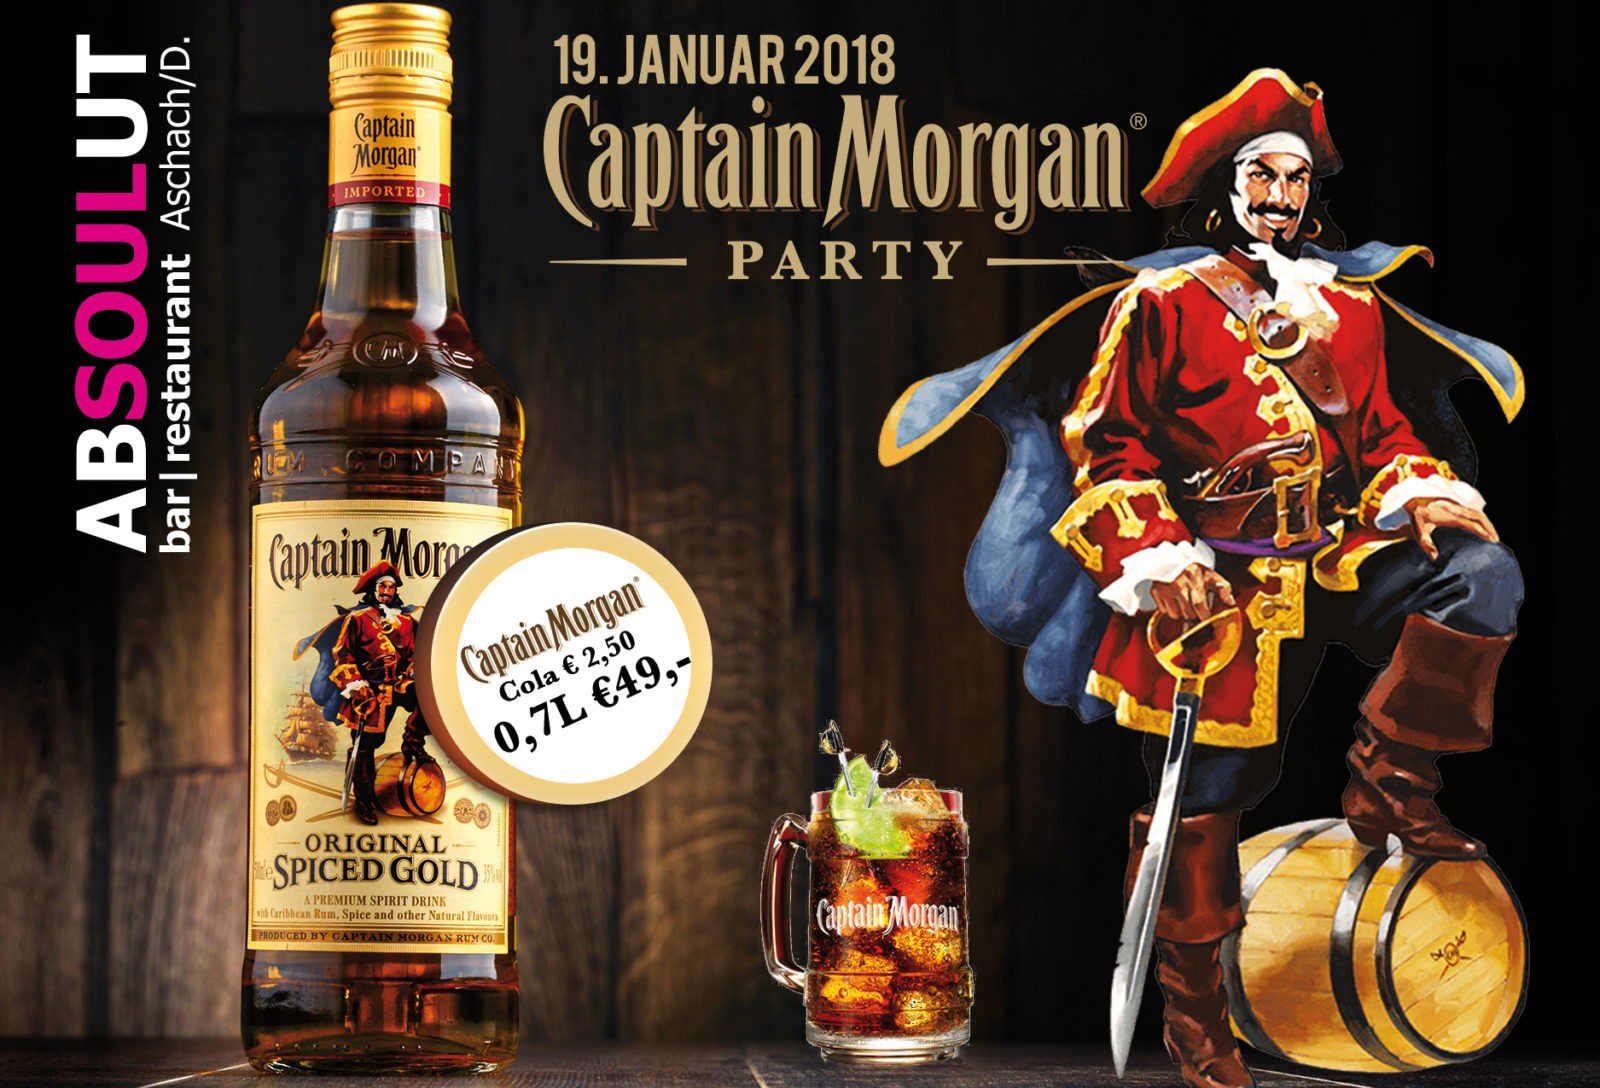 Absolut Bar Restaurant Events - Captain Morgan Party